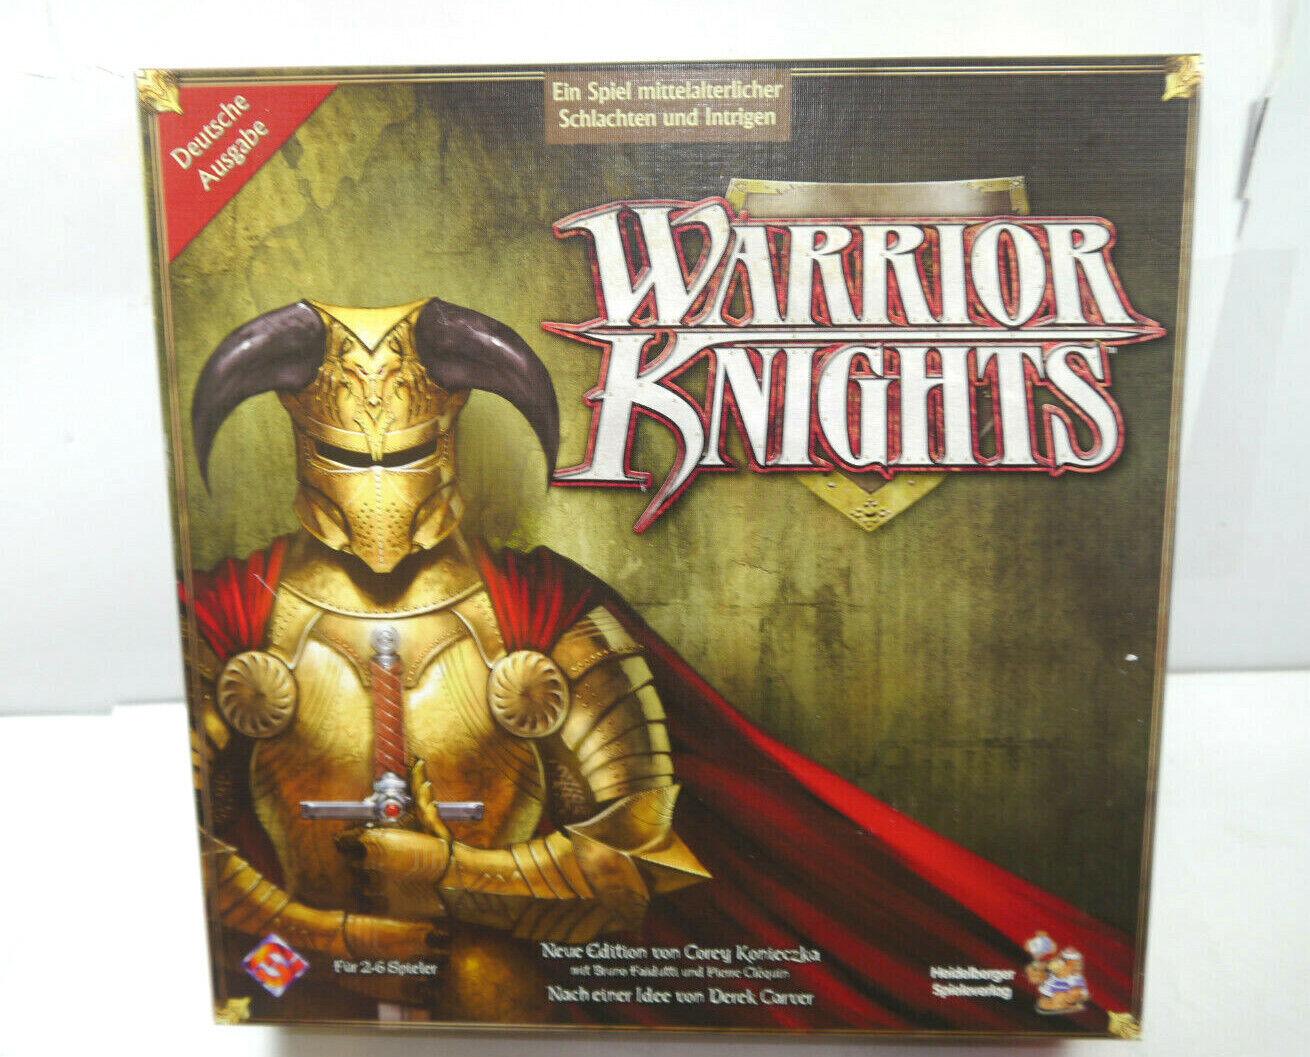 Warrior knights jeu de plateau jeu de société Heidelberger jeux Verlag (f16)